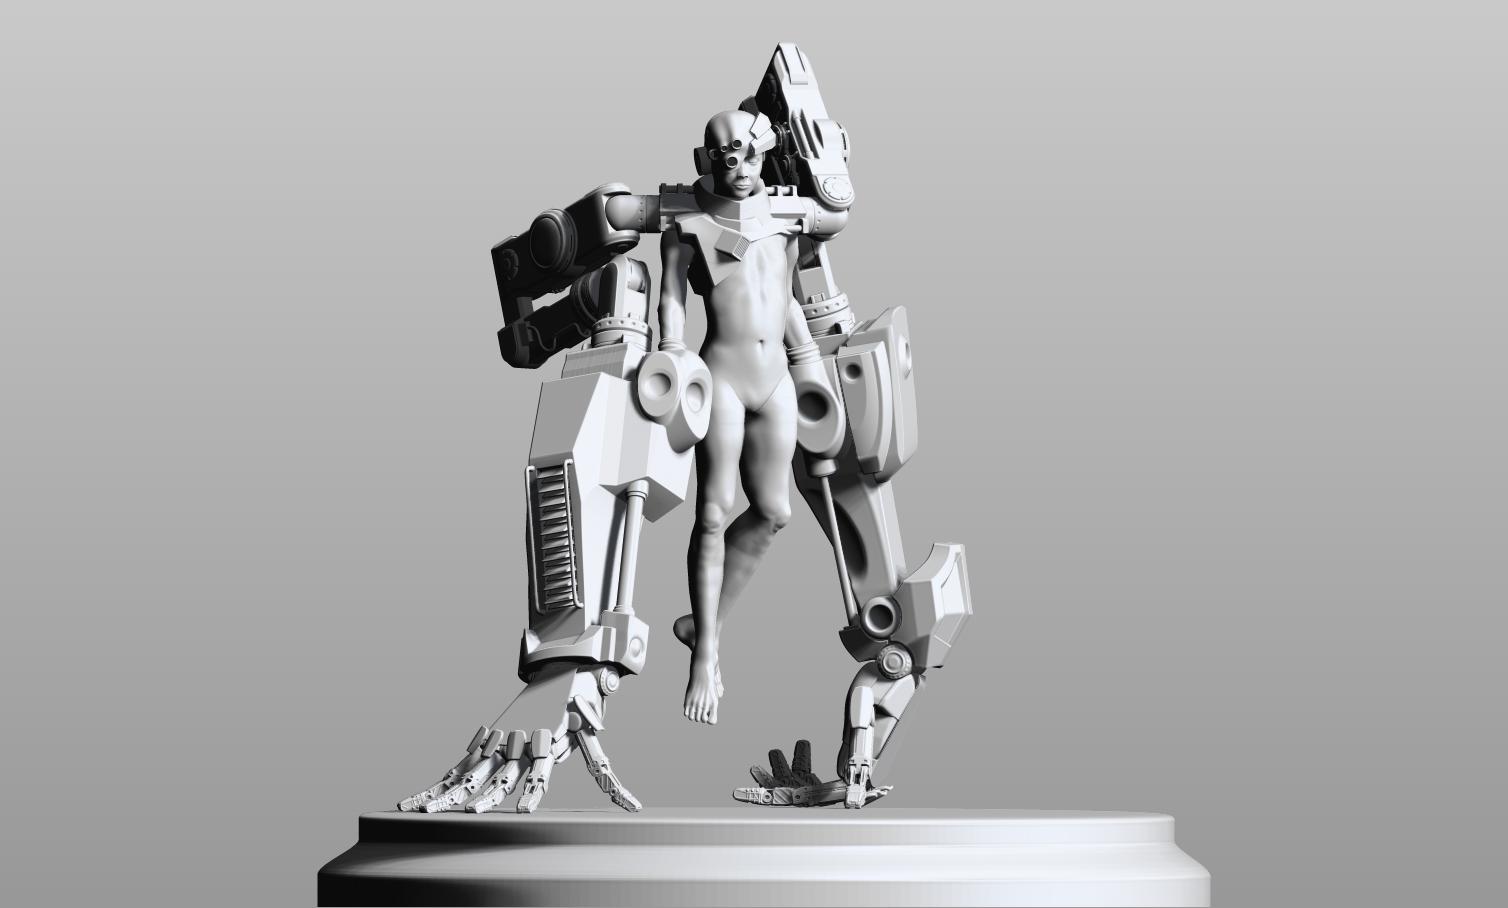 Mek -ID - All aspects. WORK IN PROGRESS.Sculpted in Zbrush. Retopologized in Topogun. Rendered in Keyshot. Concept by Lucian Stanculescu